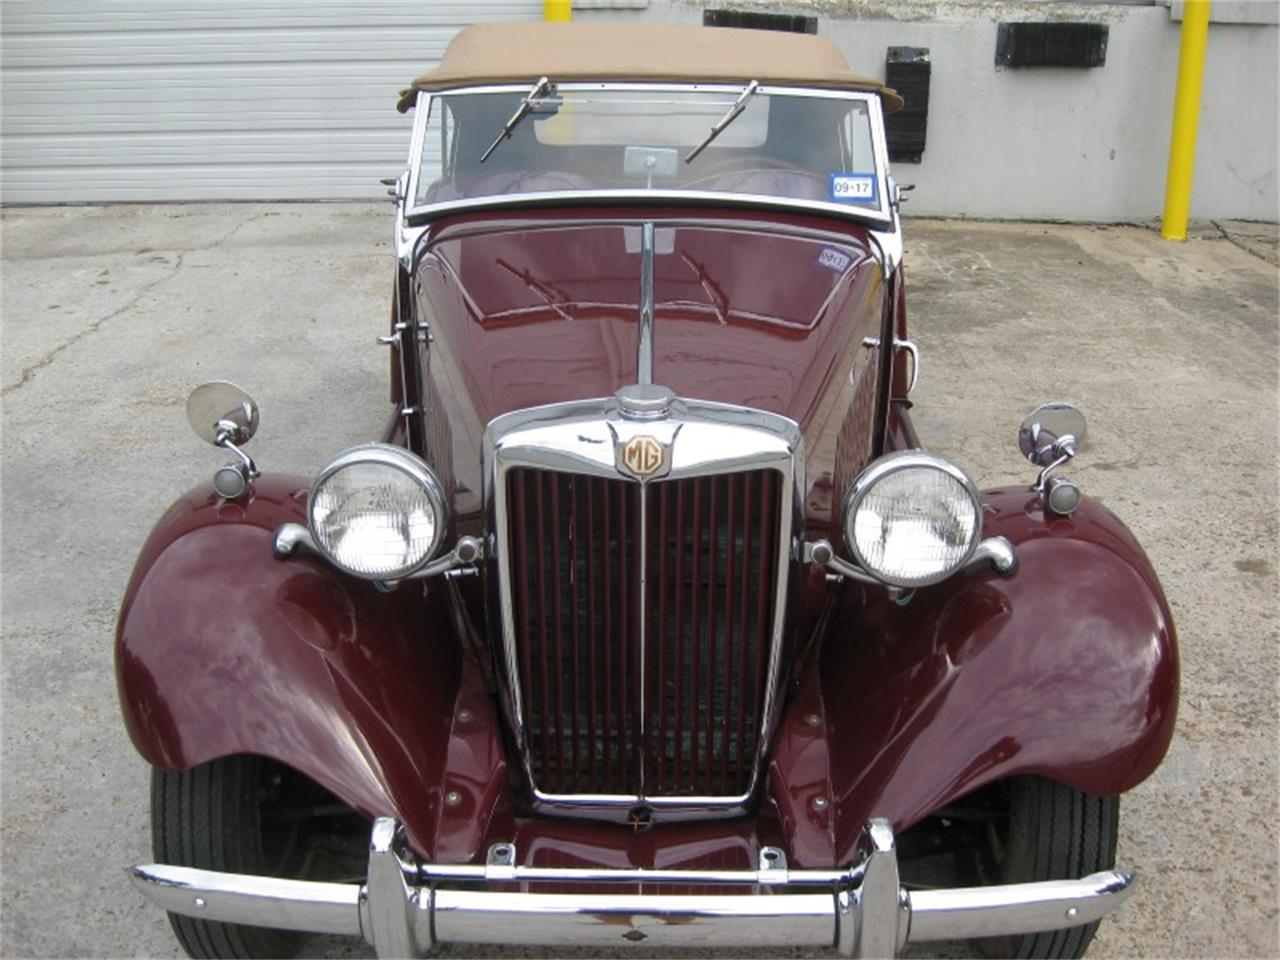 1950 MG TD for Sale | ClassicCars.com | CC-9826961950s Cars For Sale Texas